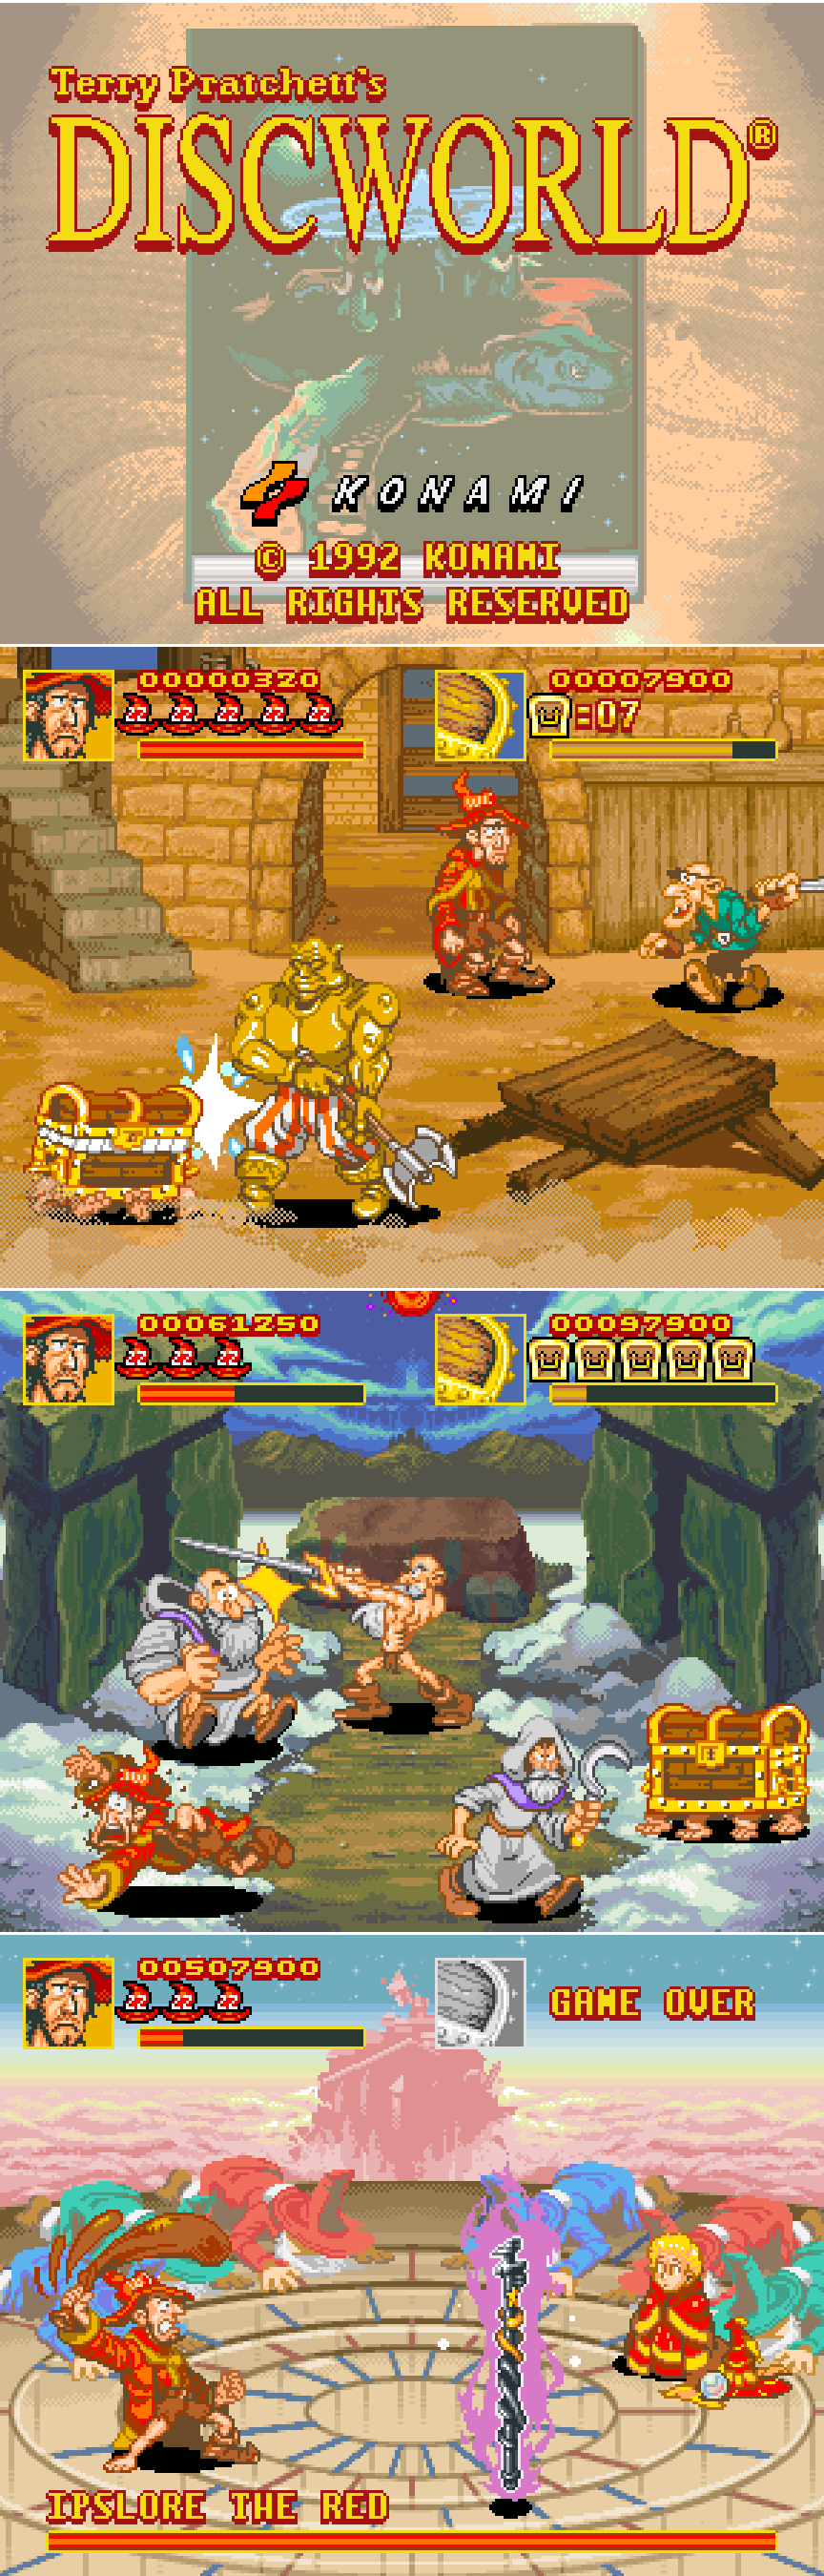 Discworld Arcade Game Mockup